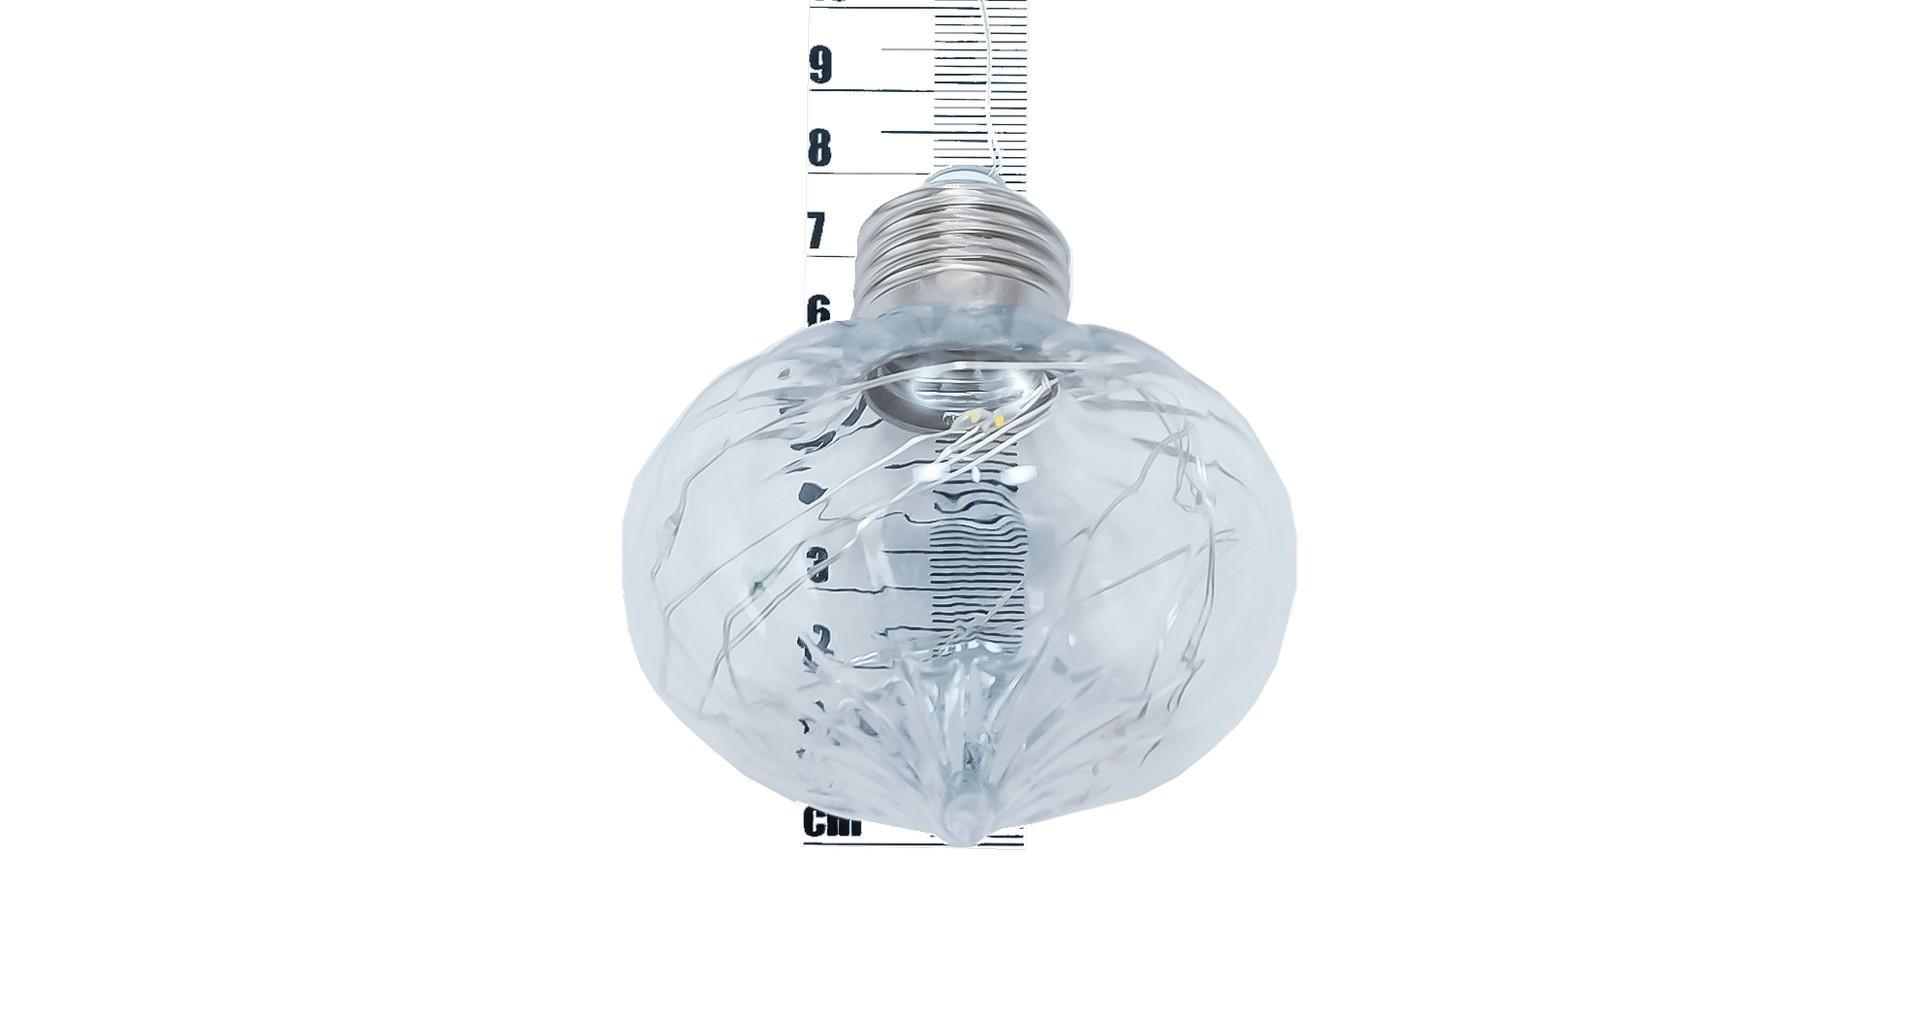 Гирлянда-дождик светодиодная NY - 125 LED Curtion Blue 2